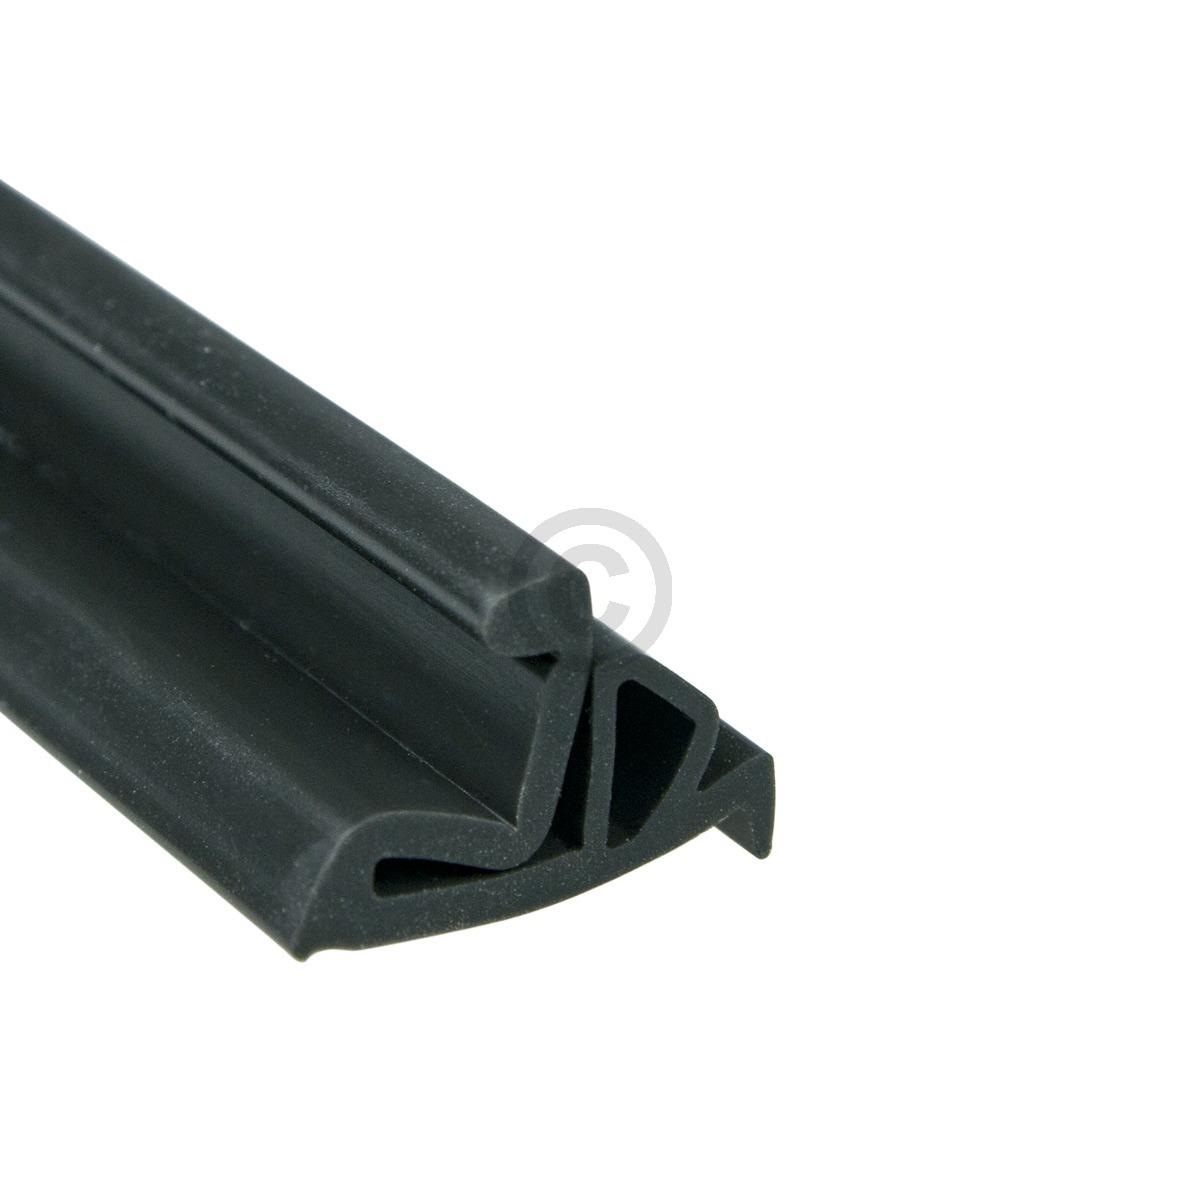 Türdichtung rundum Zanussi 356514401/5 Alternative für Backofen AEG, Electrolux,